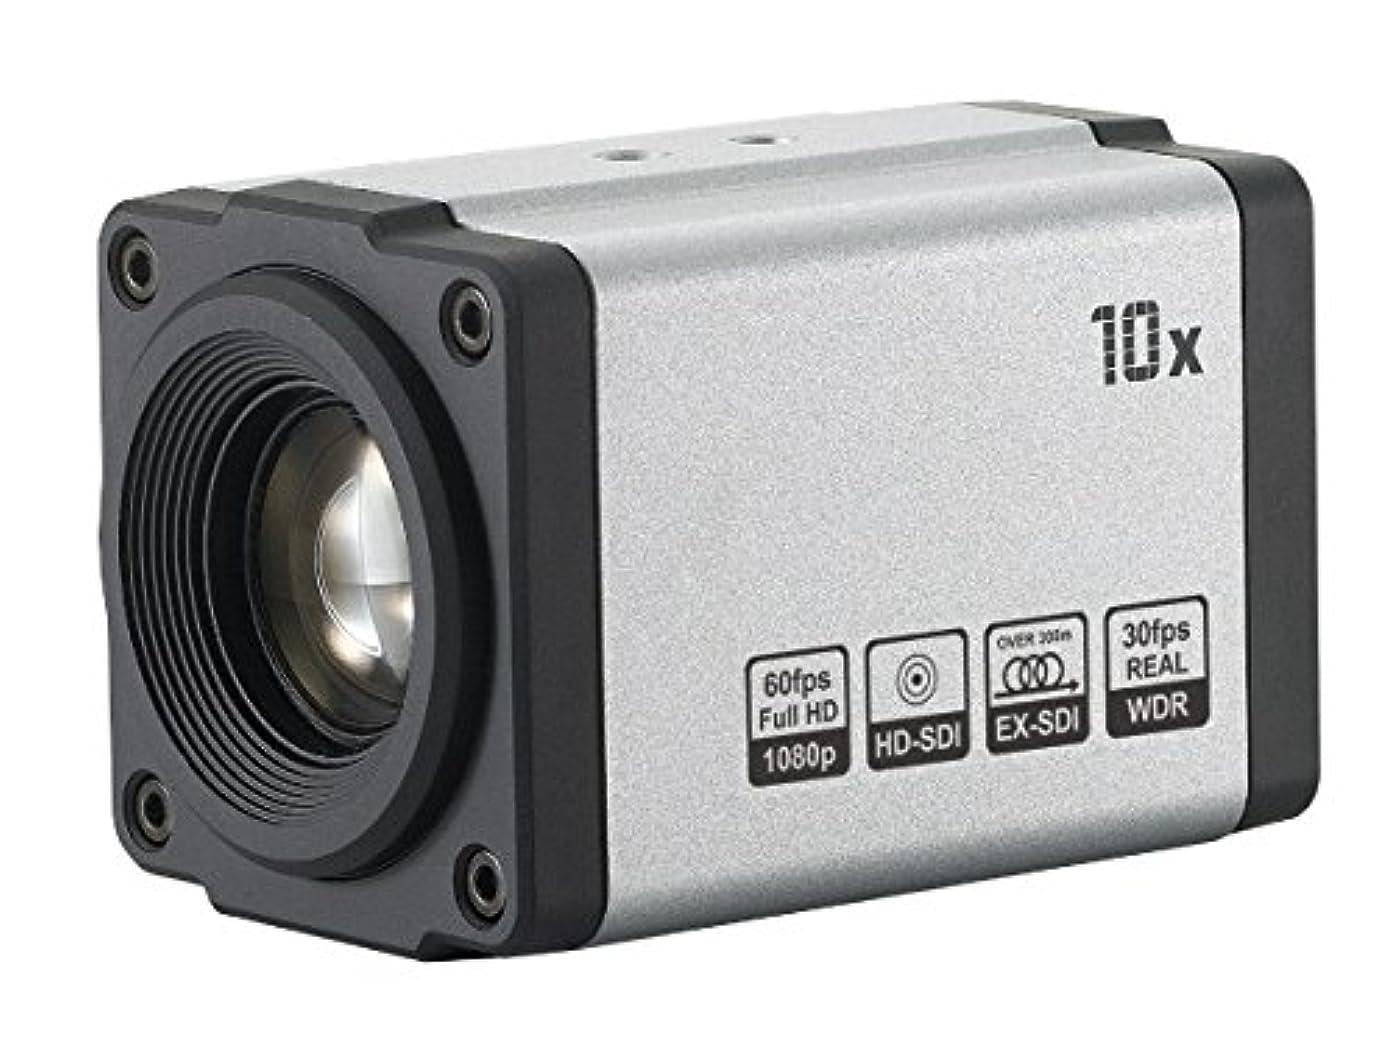 Wonwoo MB-108 2 megapixel x10 zoom camera HD-SDI / EX-SDI / TVI2.0 / 960H output